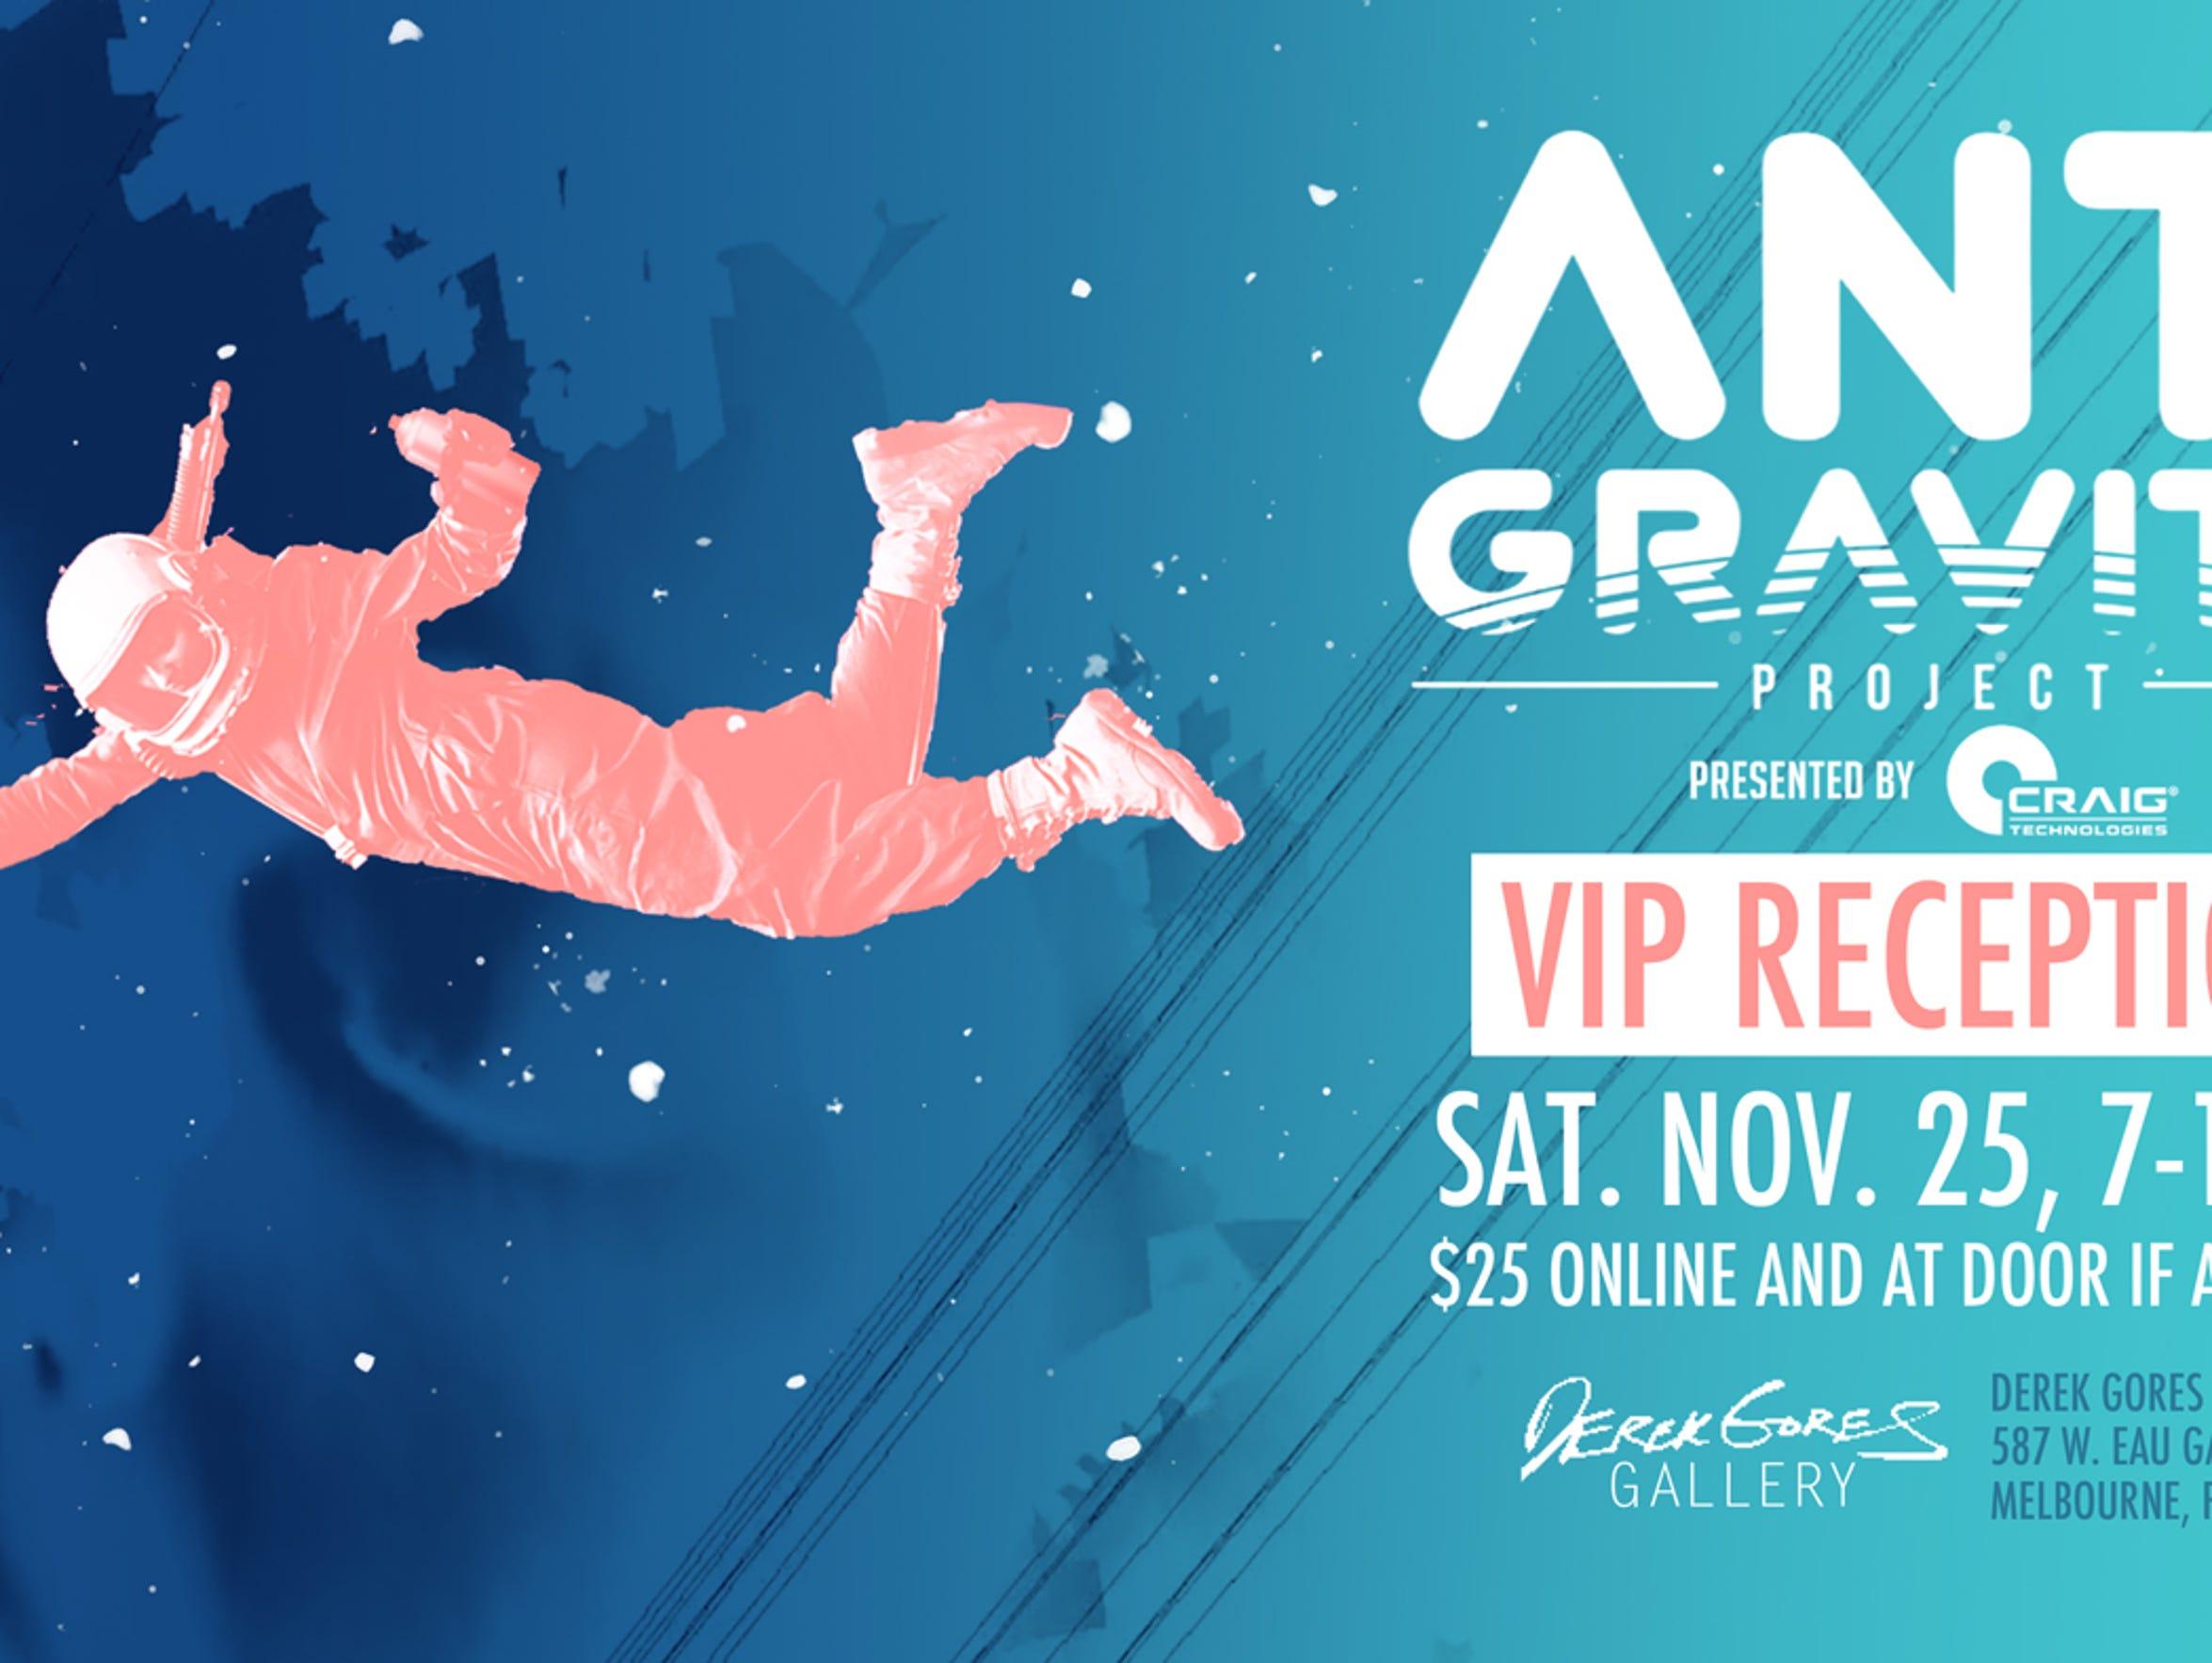 Derek Gores will host the VIP reception for Anti-Gravity